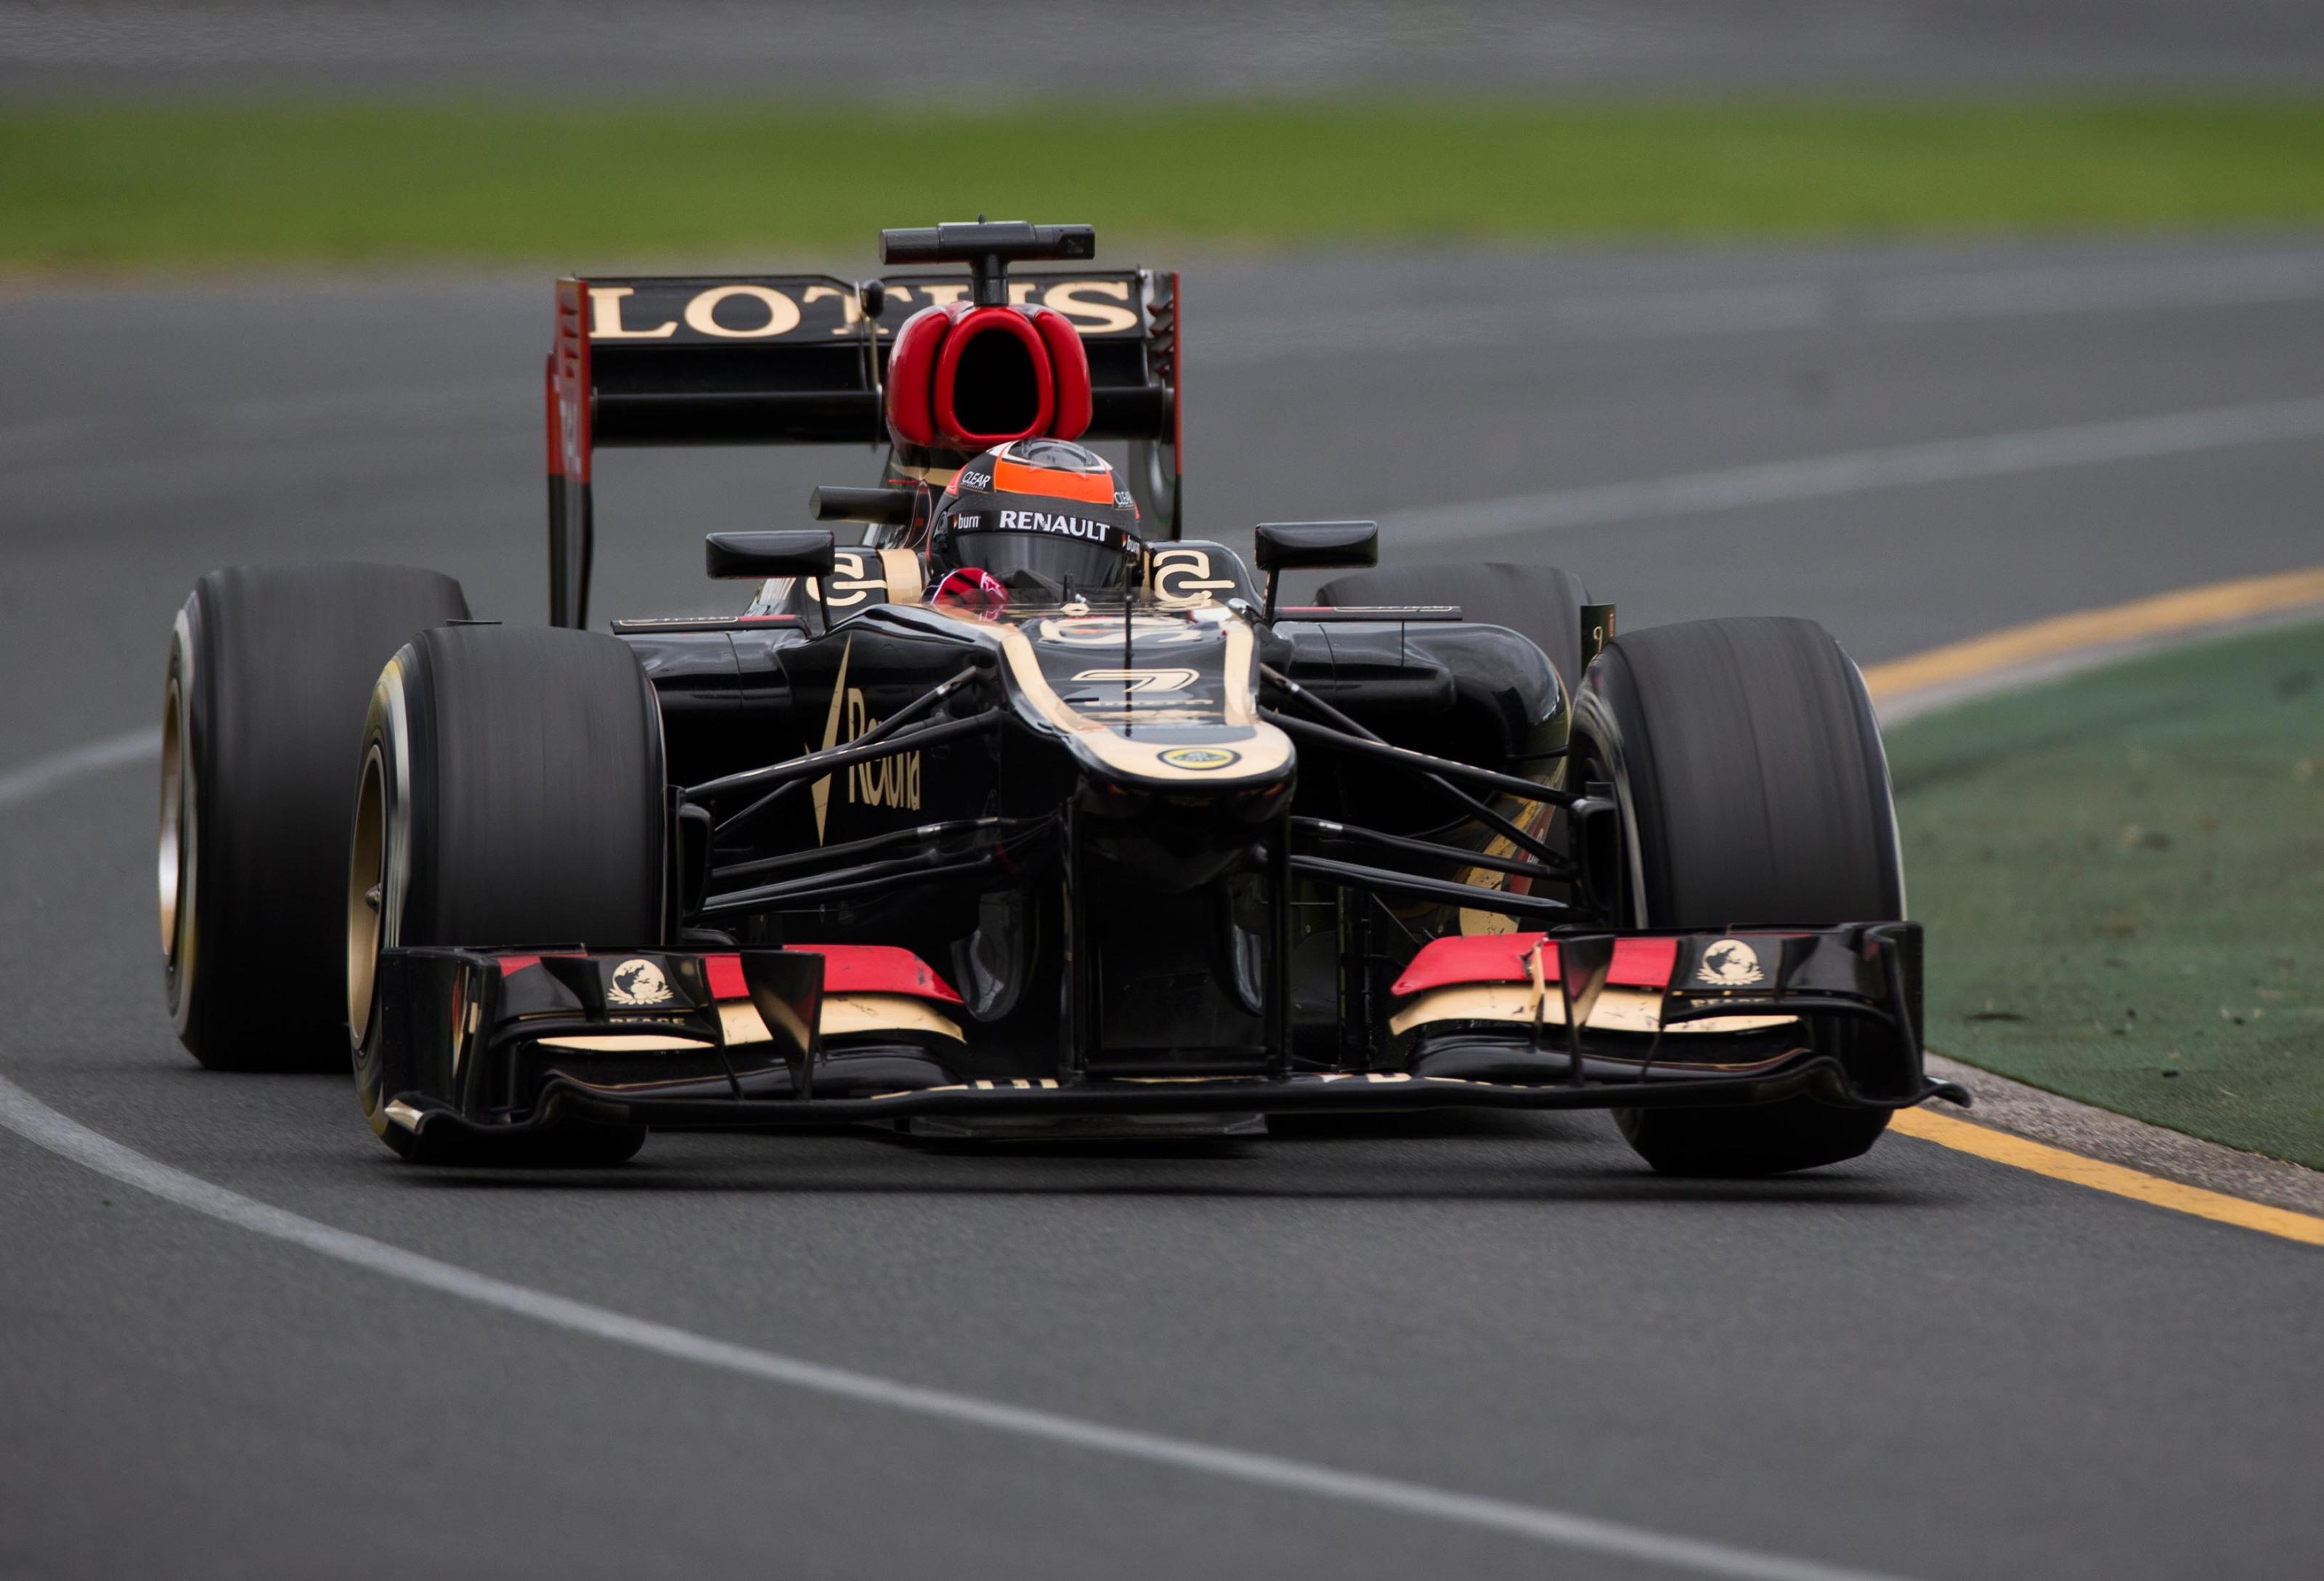 Formula 1: The last time Mercedes, Ferrari or Red Bull Racing didn't win